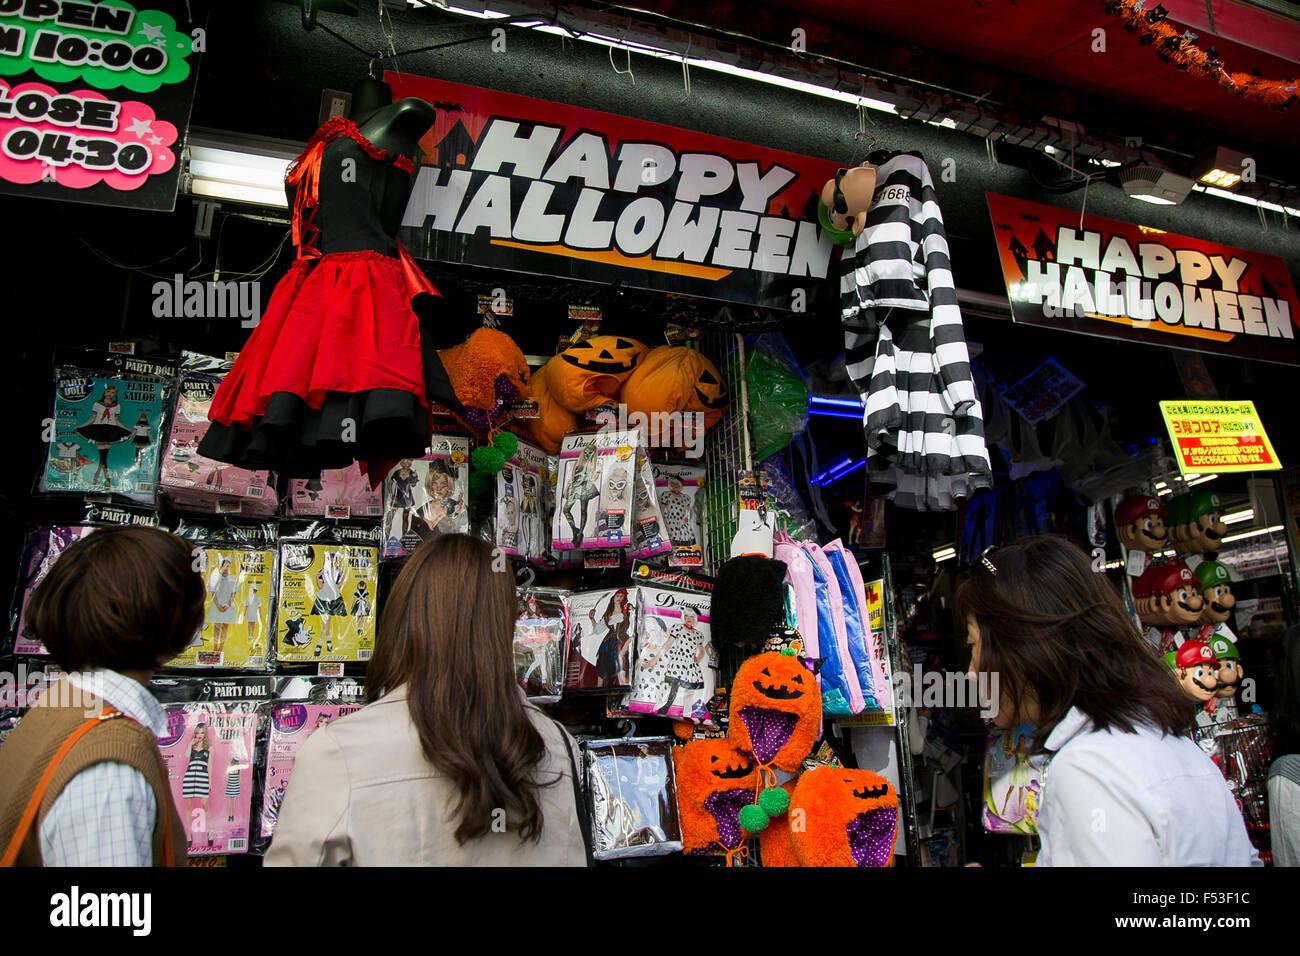 Tokyo, Japan. 27th Oct, 2015. People look at various Halloween ...